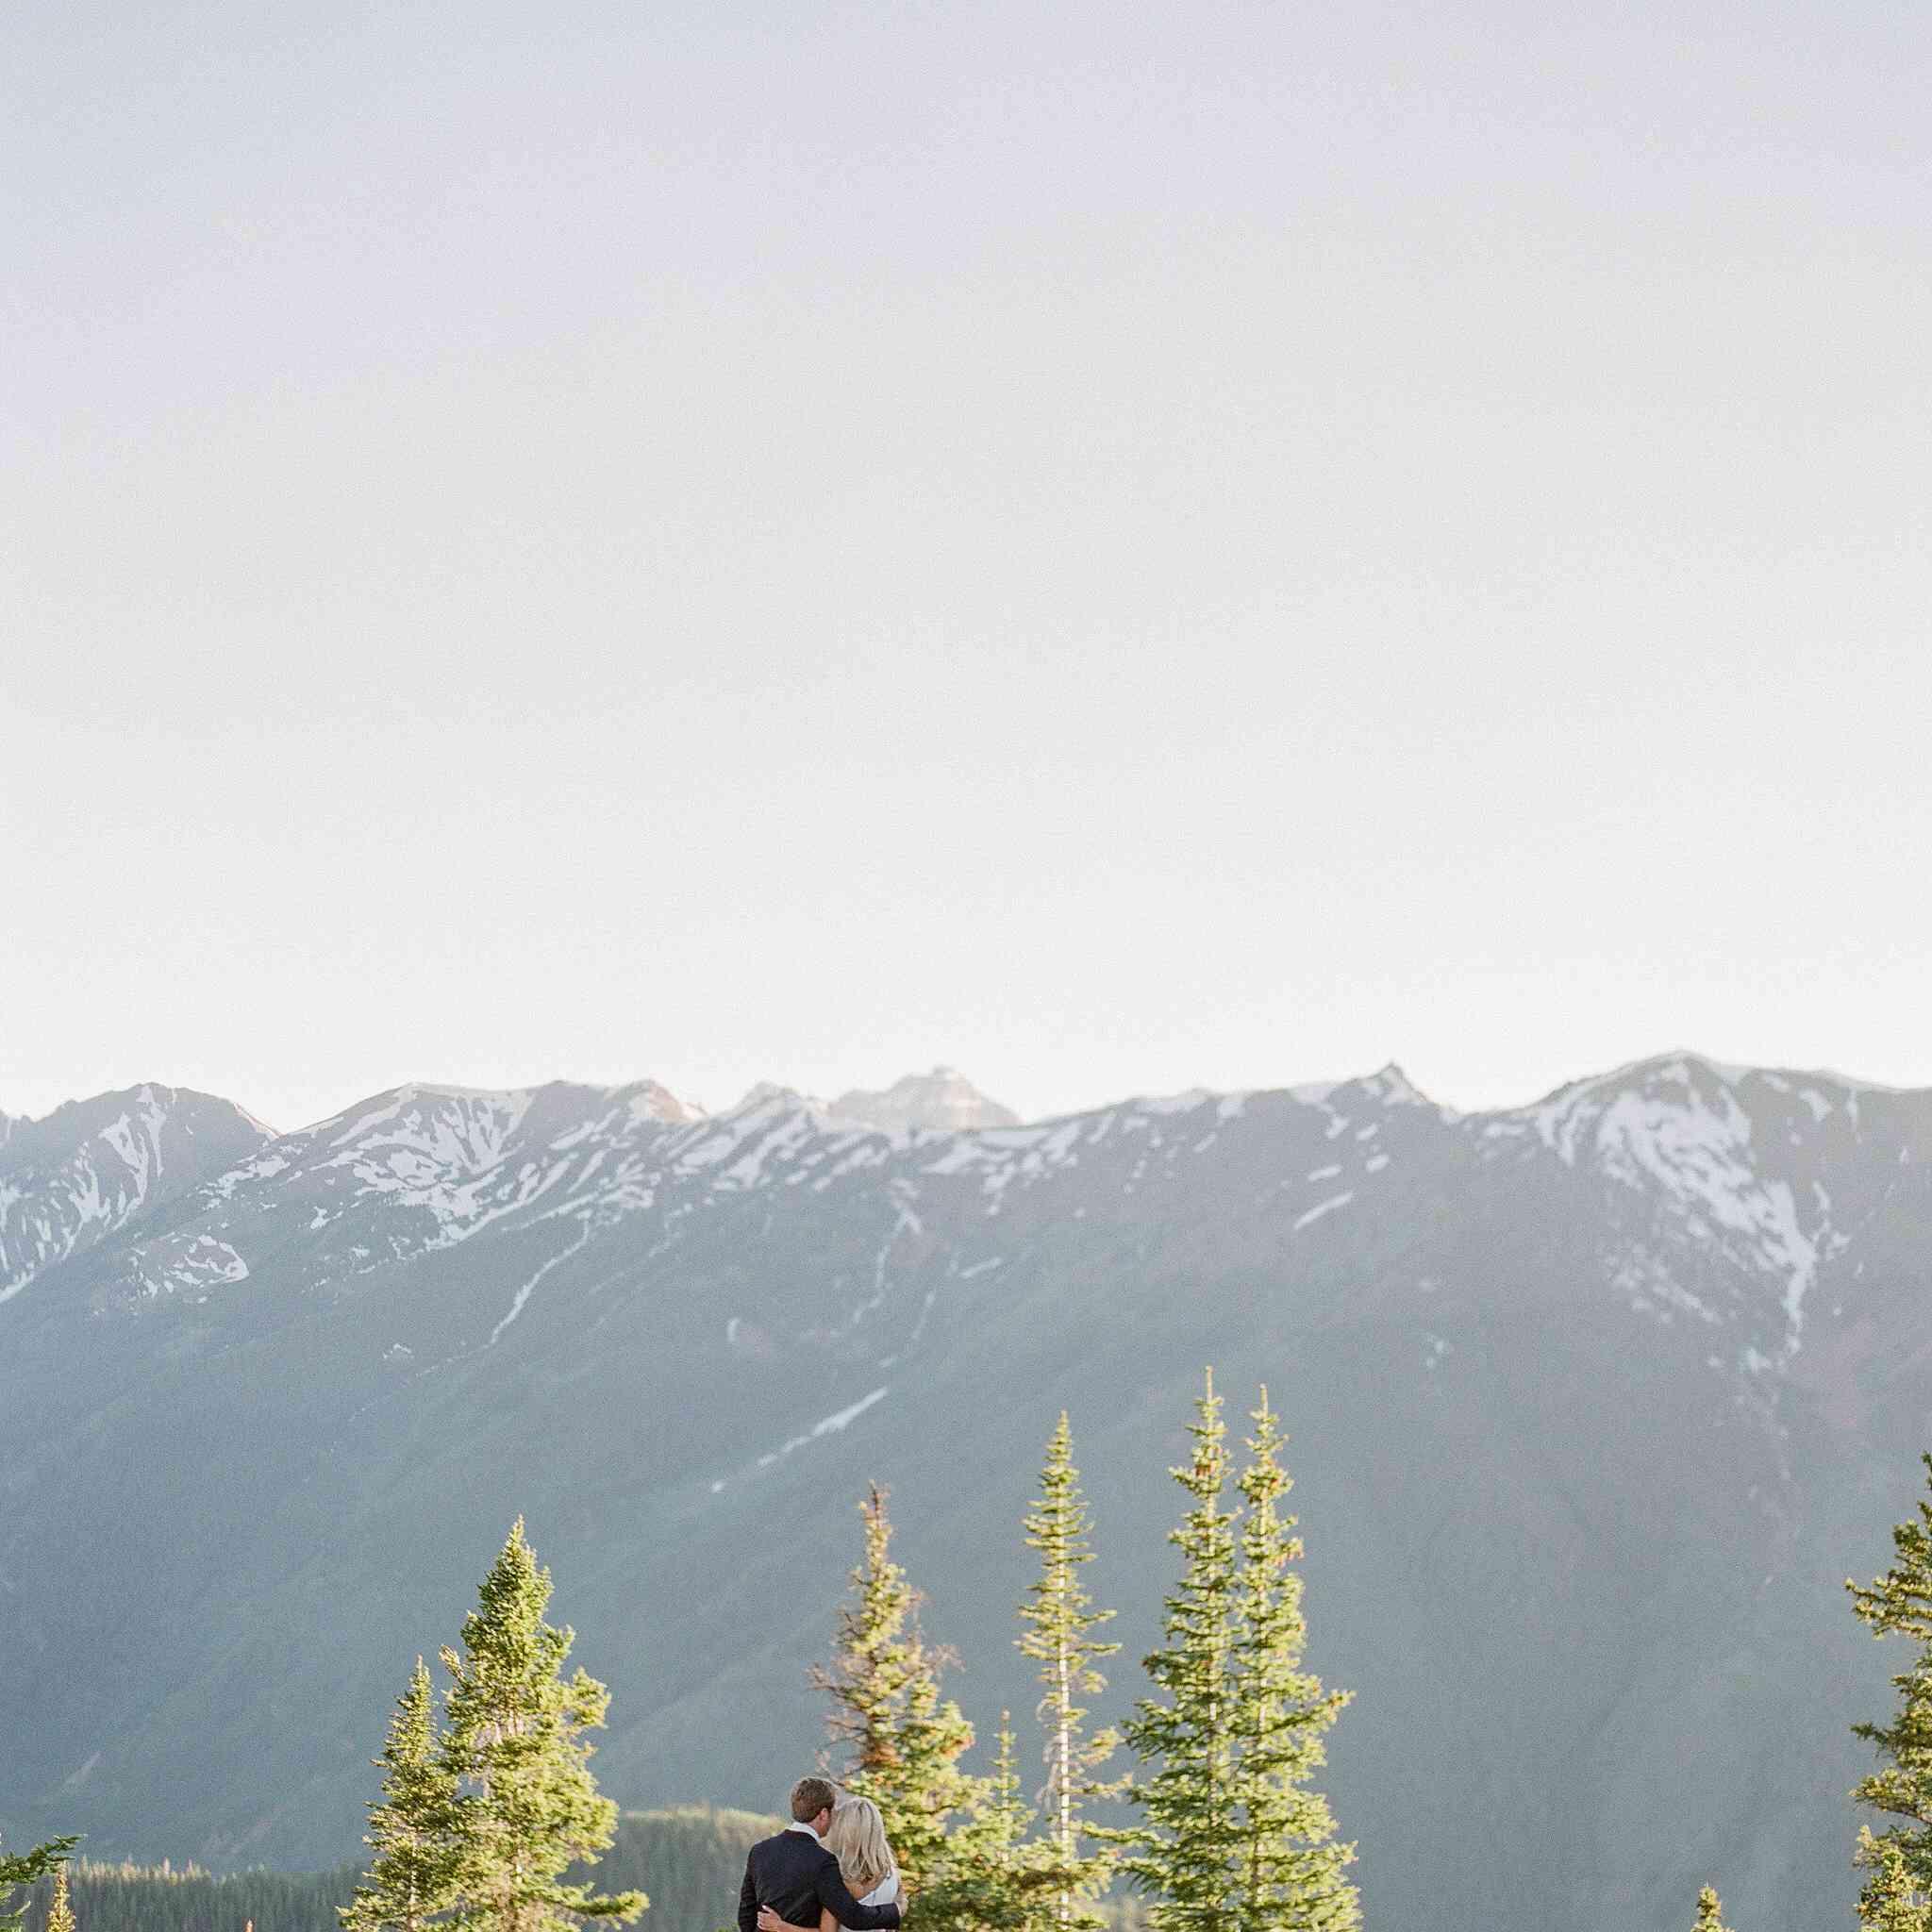 Bride and groom overlooking mountain